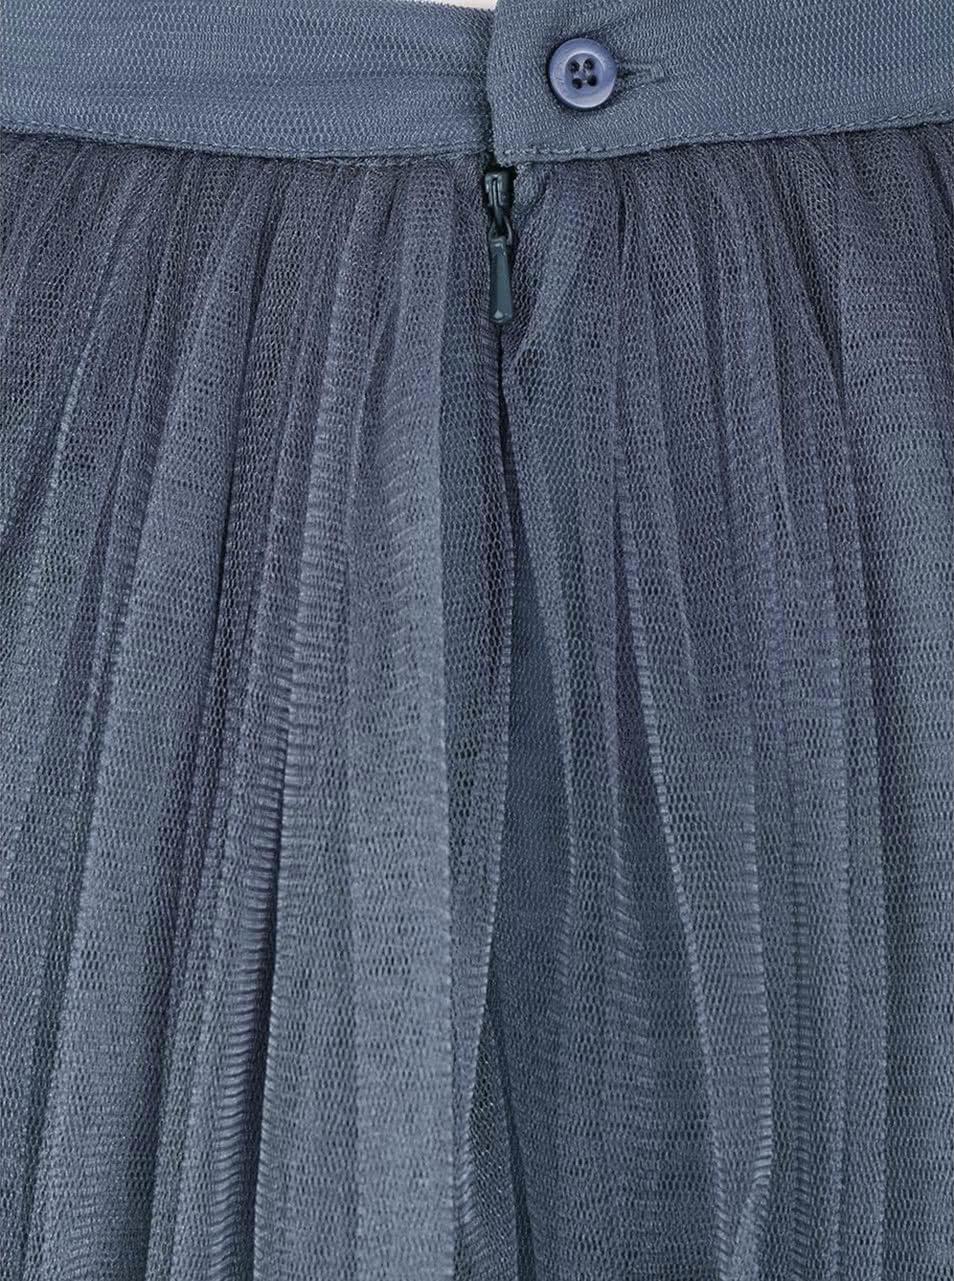 Levanduľová tylová midi sukňa Little Mistress ... 769707eb3c